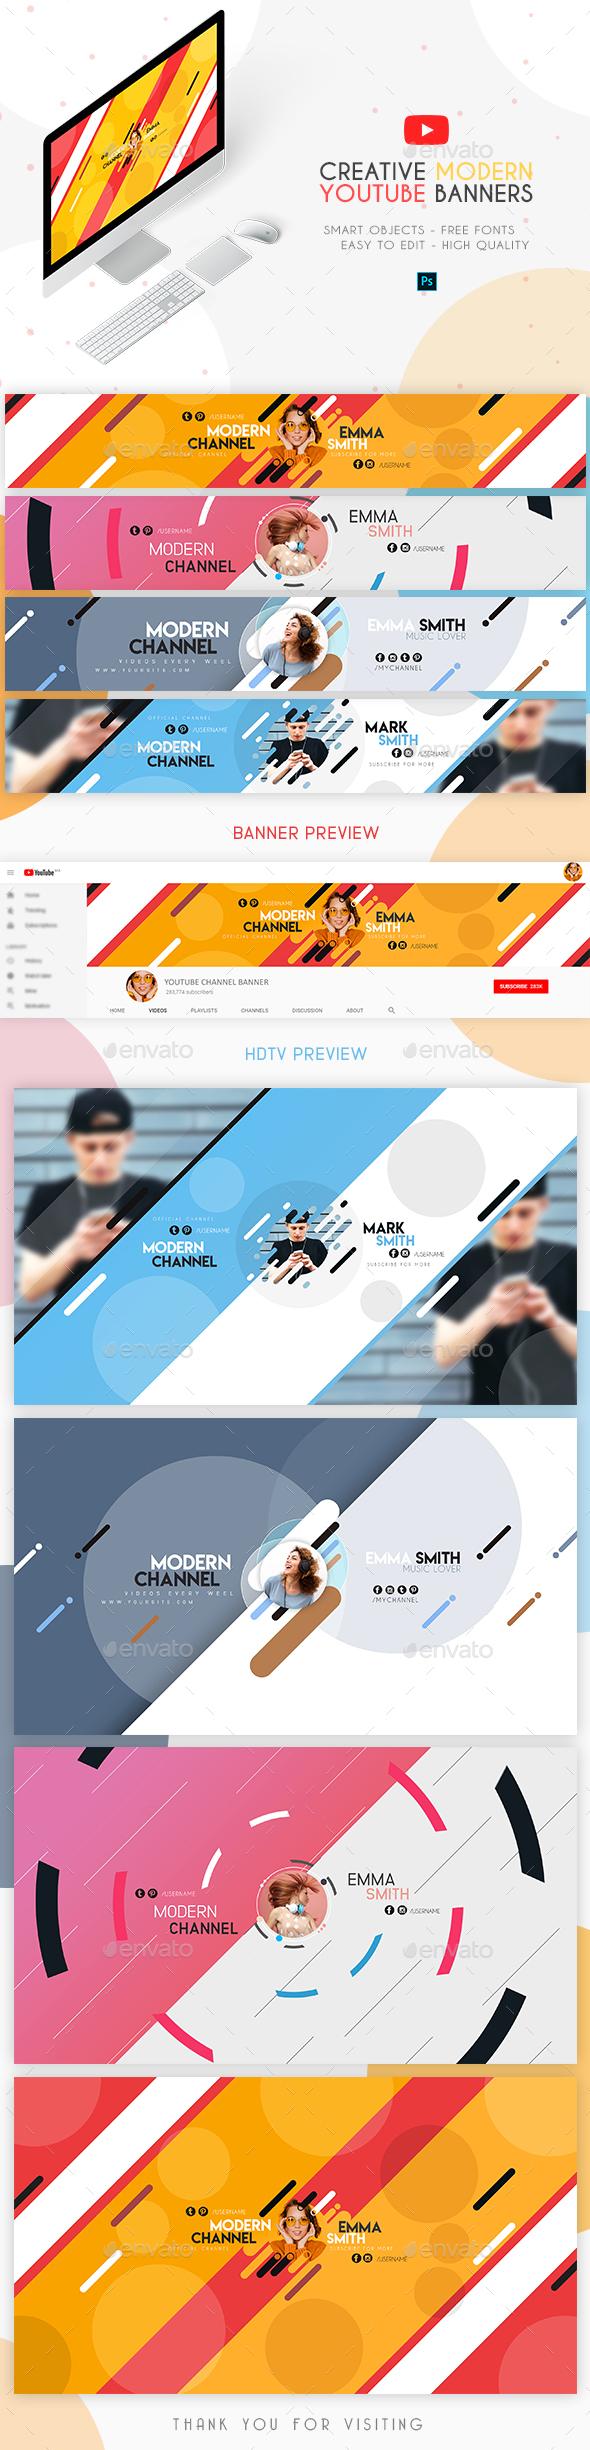 4 Modern YouTube Banners - YouTube Social Media